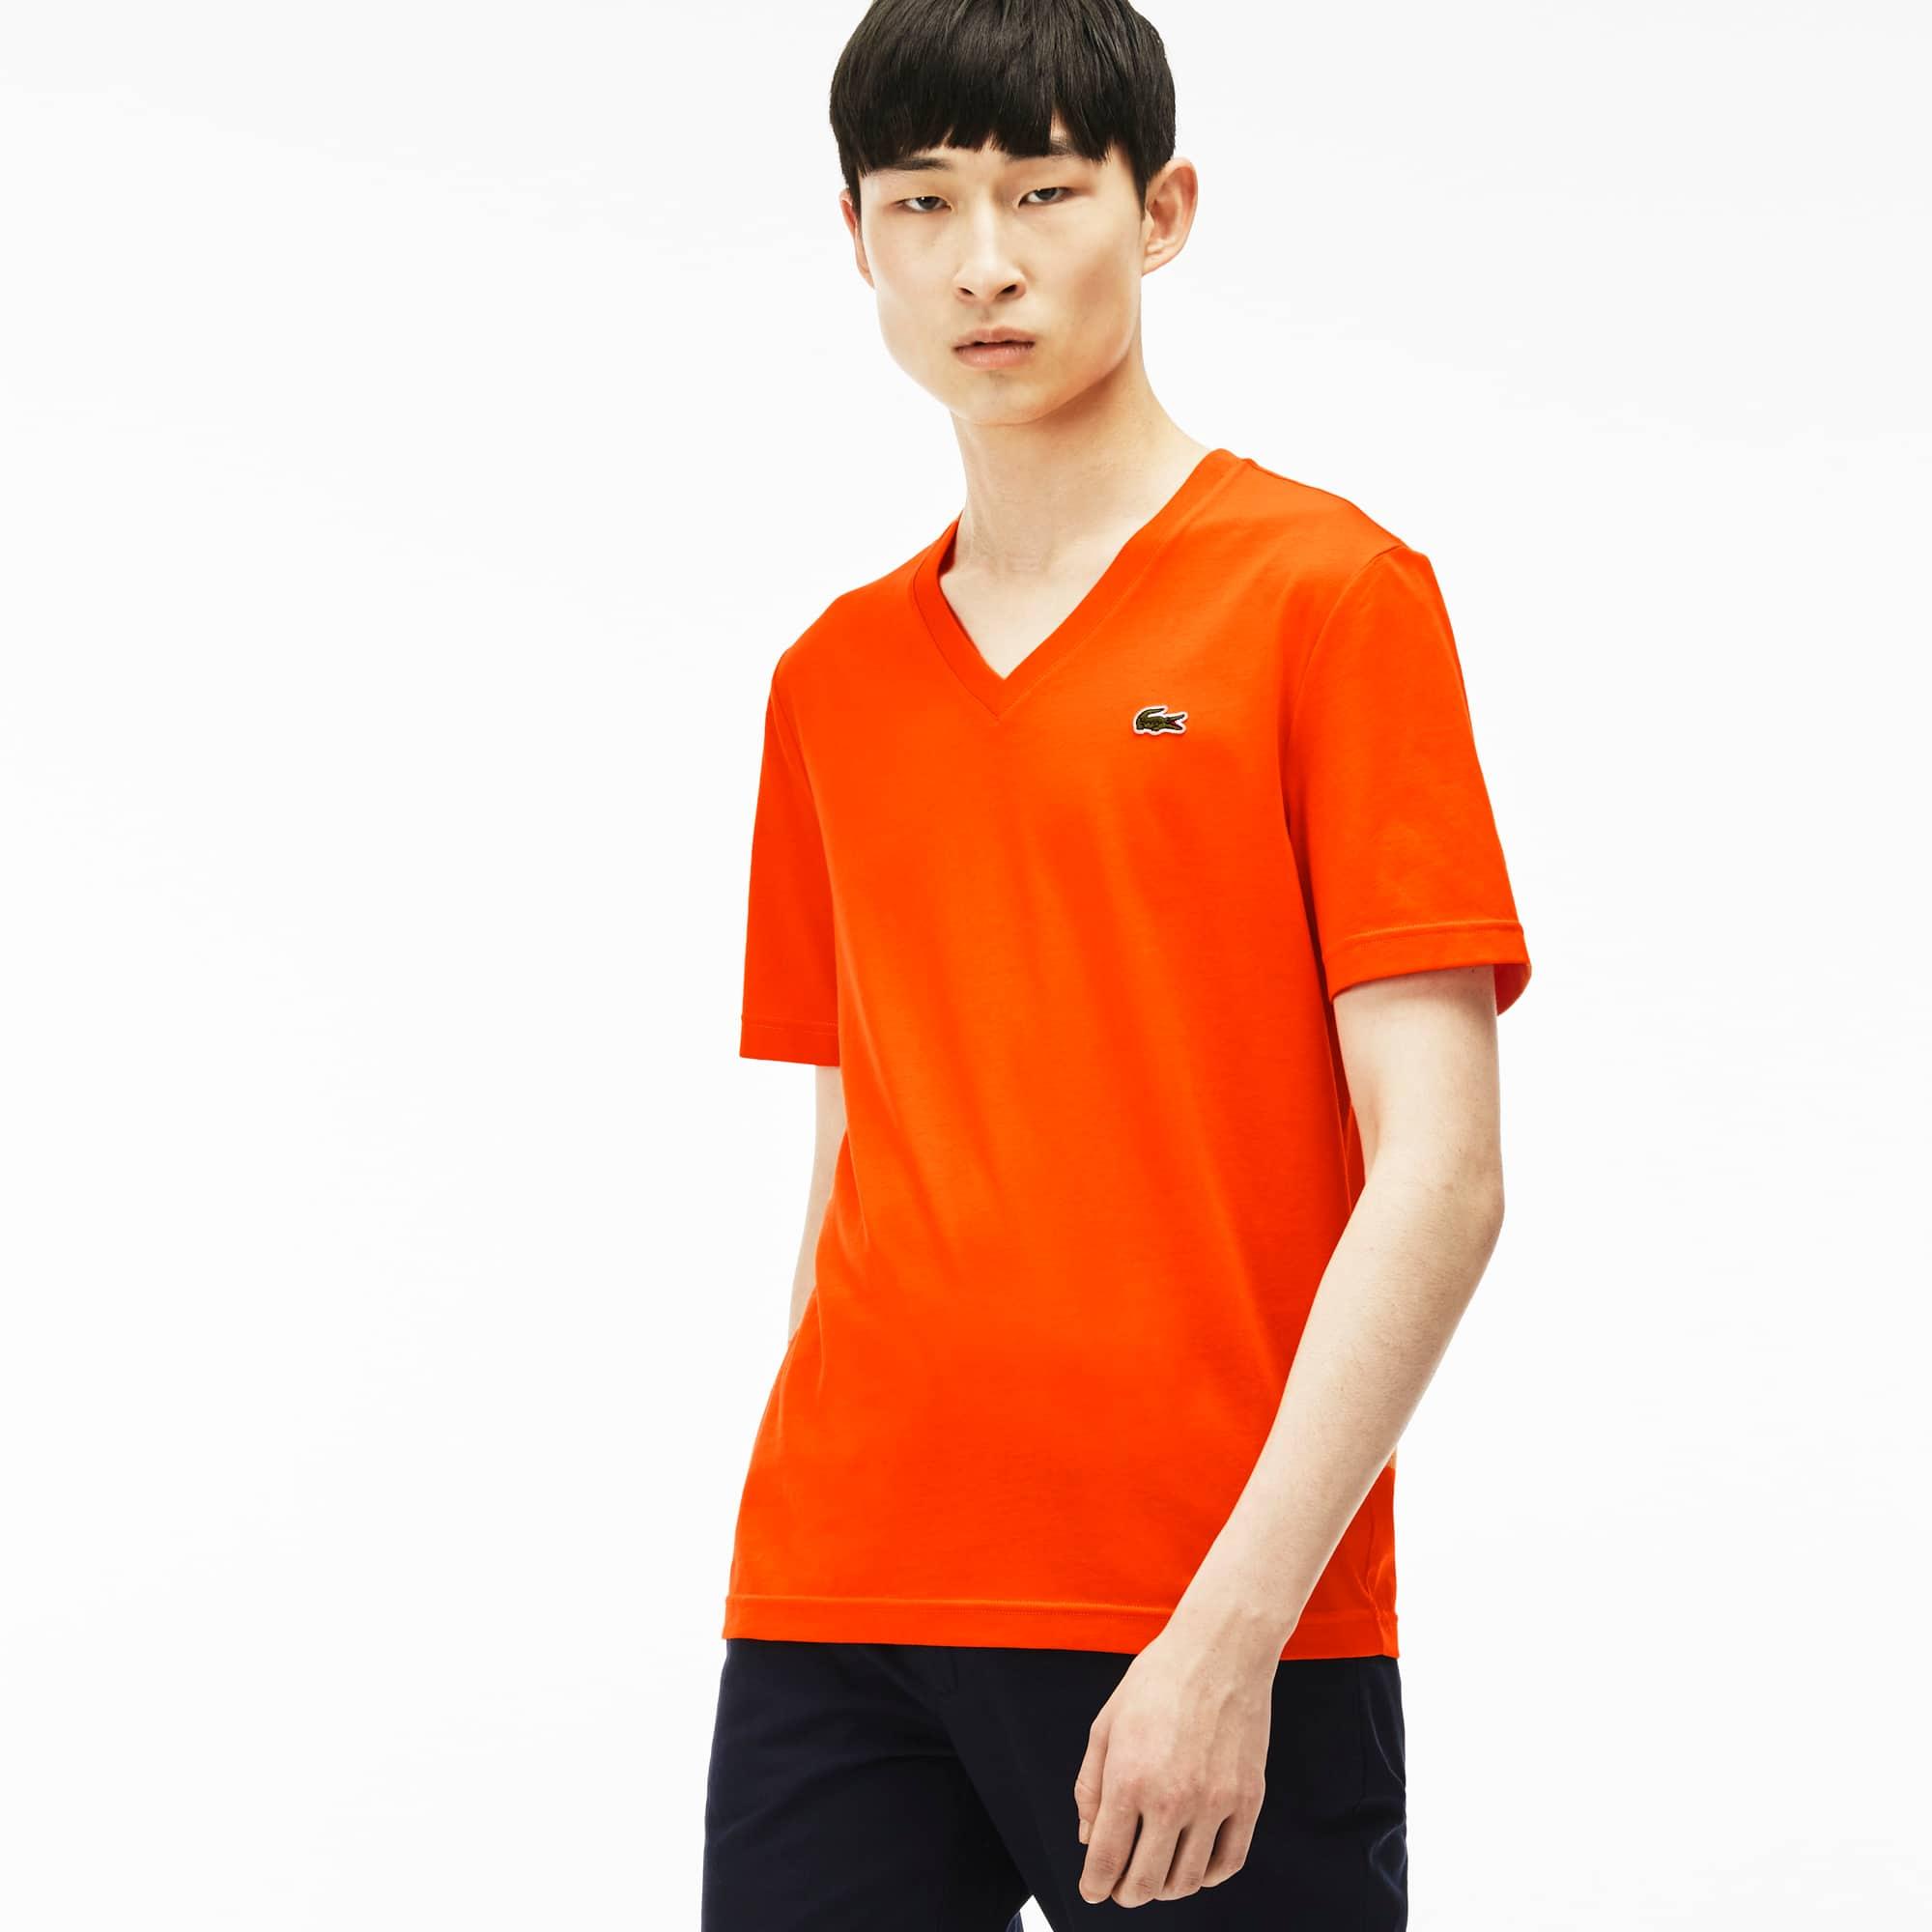 T-shirt Lacoste LIVE ultra-aderente con collo a V in jersey